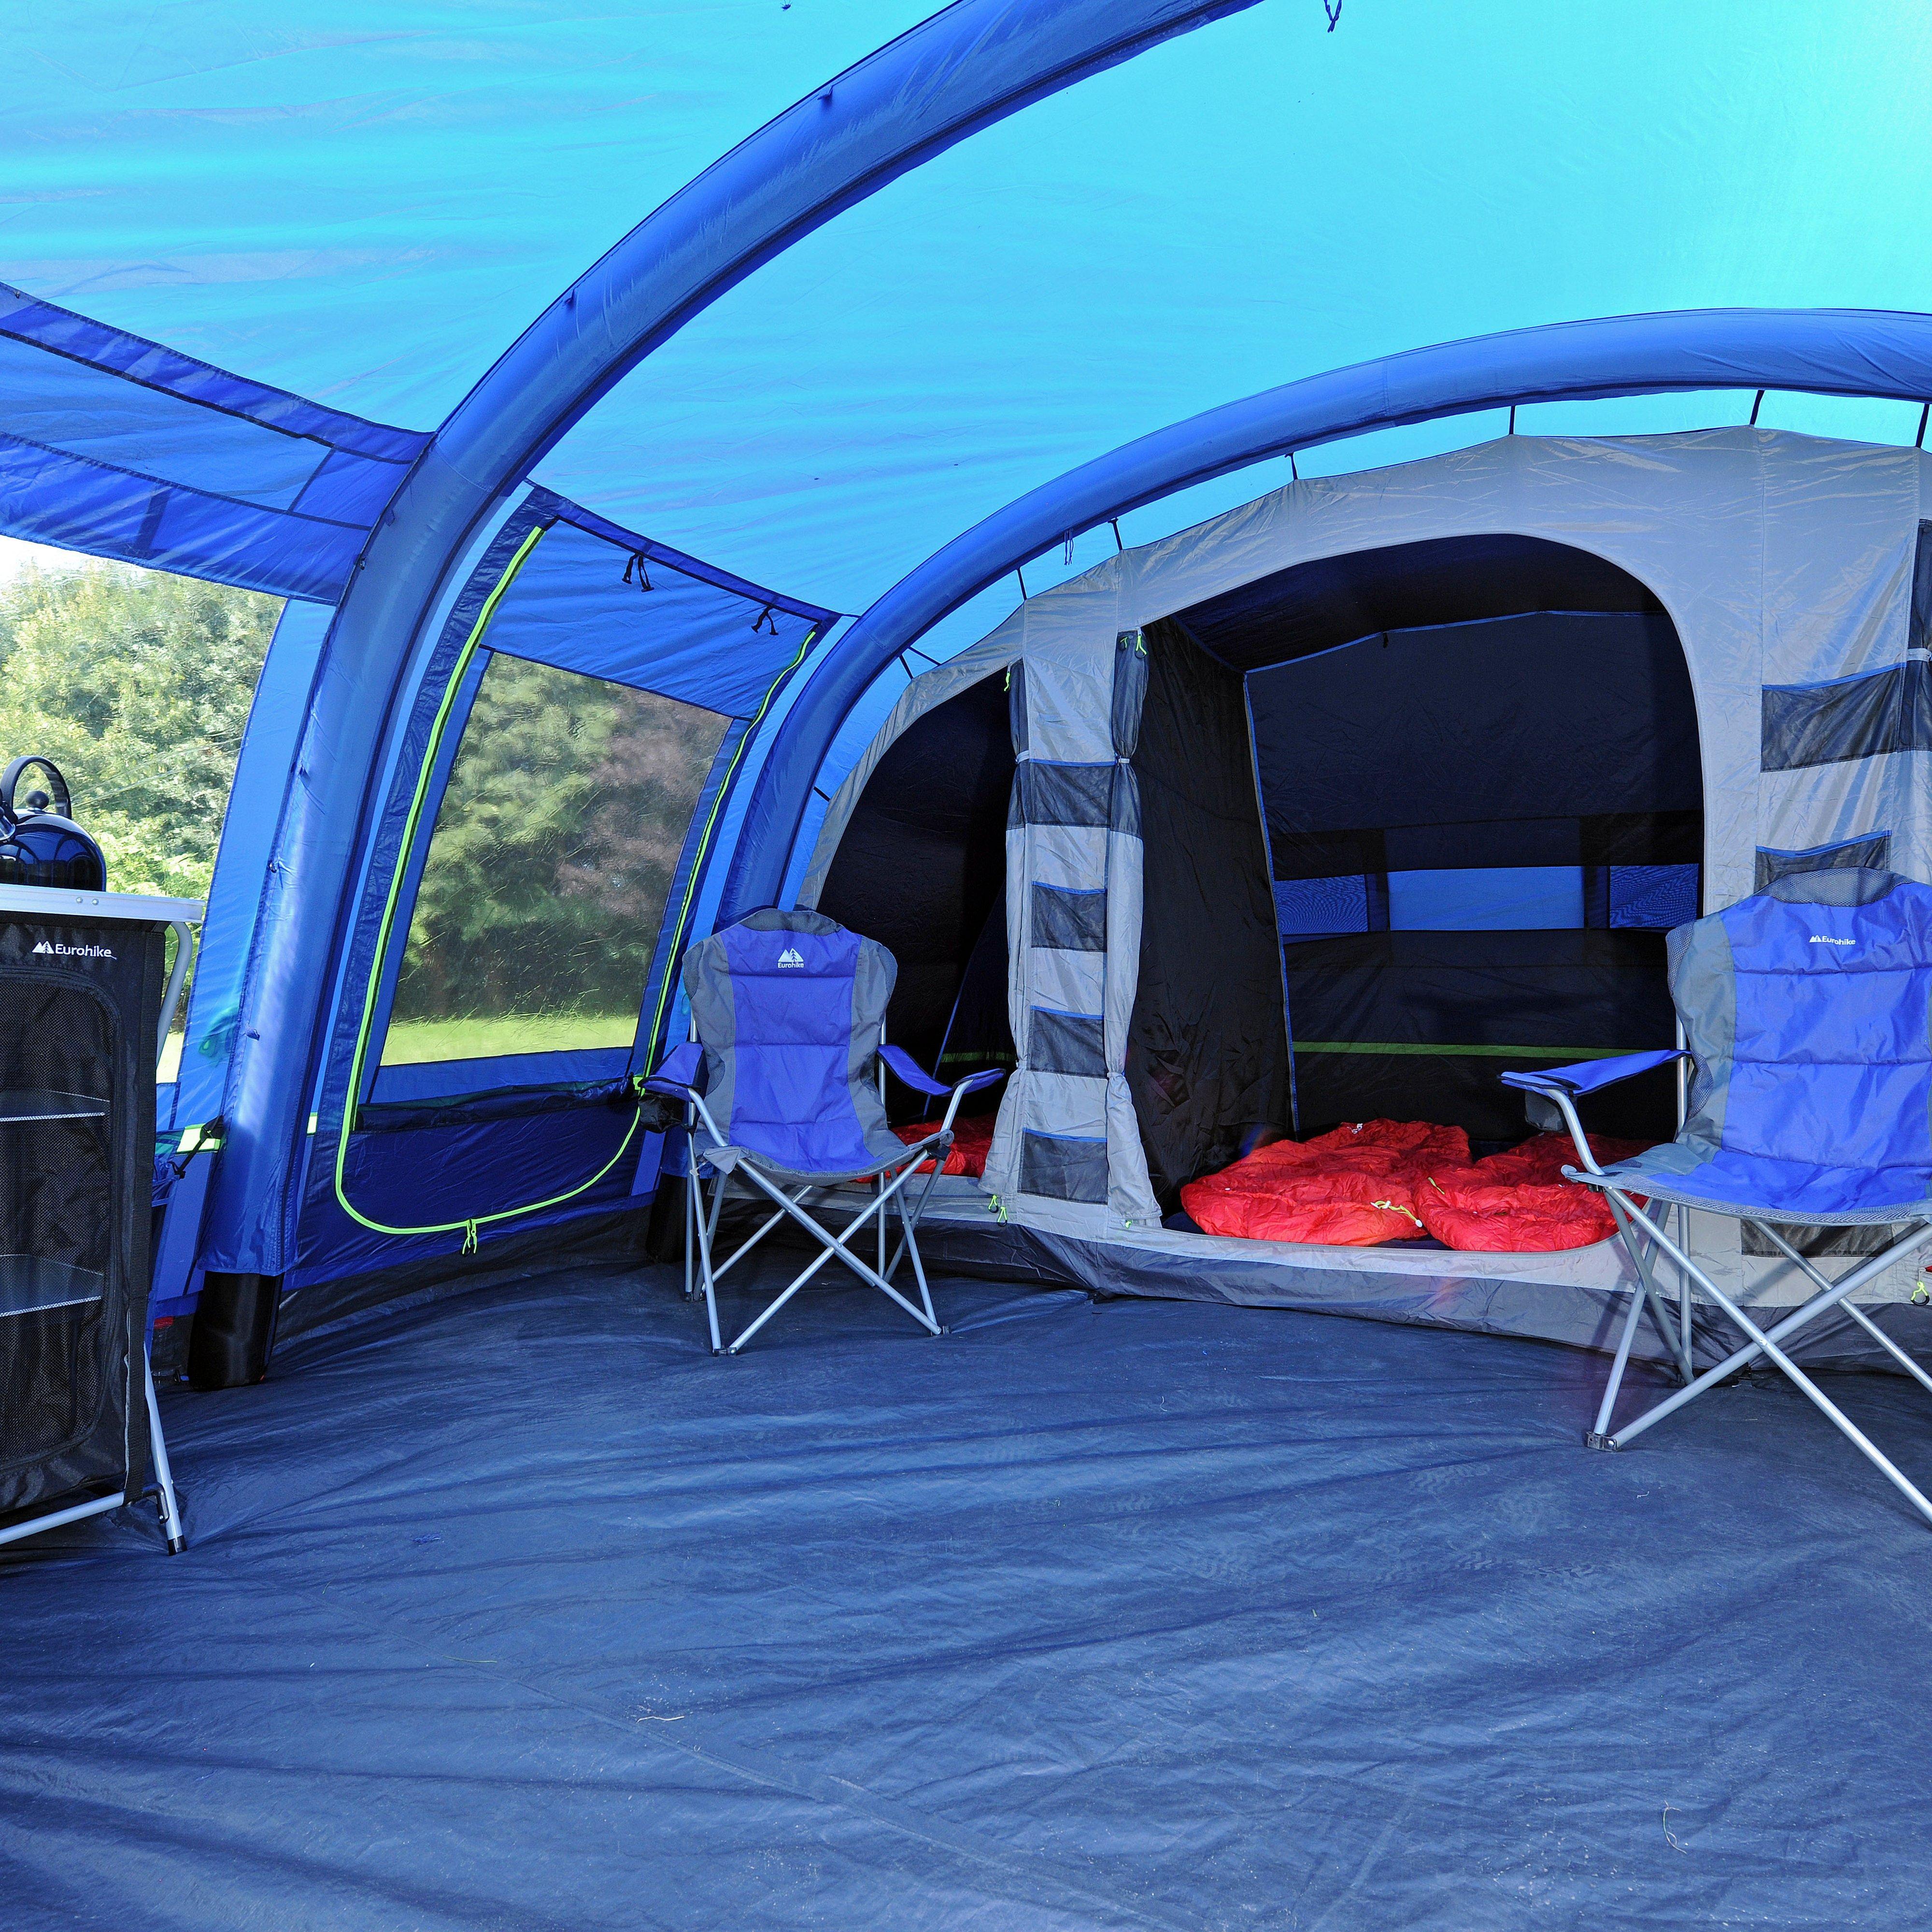 BERGHAUS Air 6XL Family Tent & BERGHAUS Air 6XL Family Tent   Millets